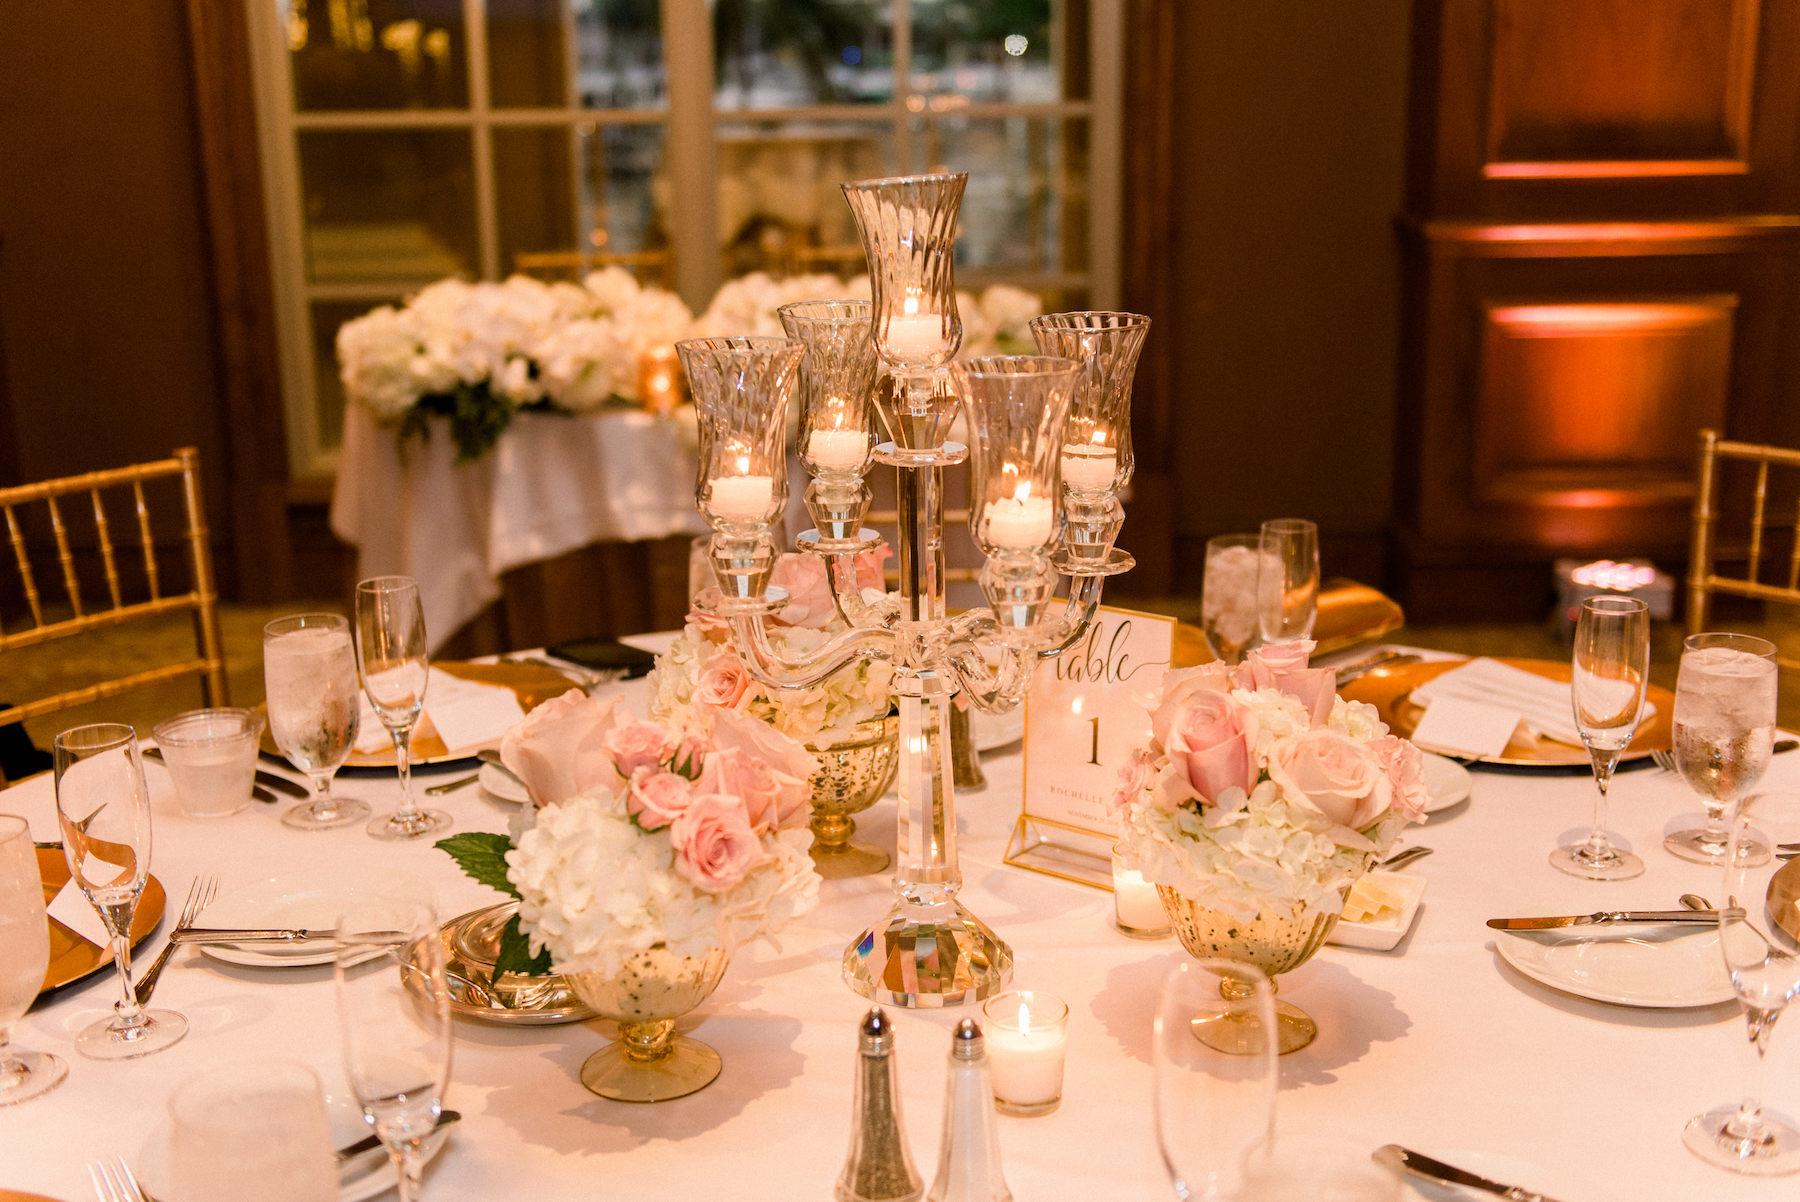 Classic Elegant Wedding Ballroom Reception Decor, Crystal Glass Candelabra Centerpiece | Tampa Wedding Planner Special Moments Event Planning